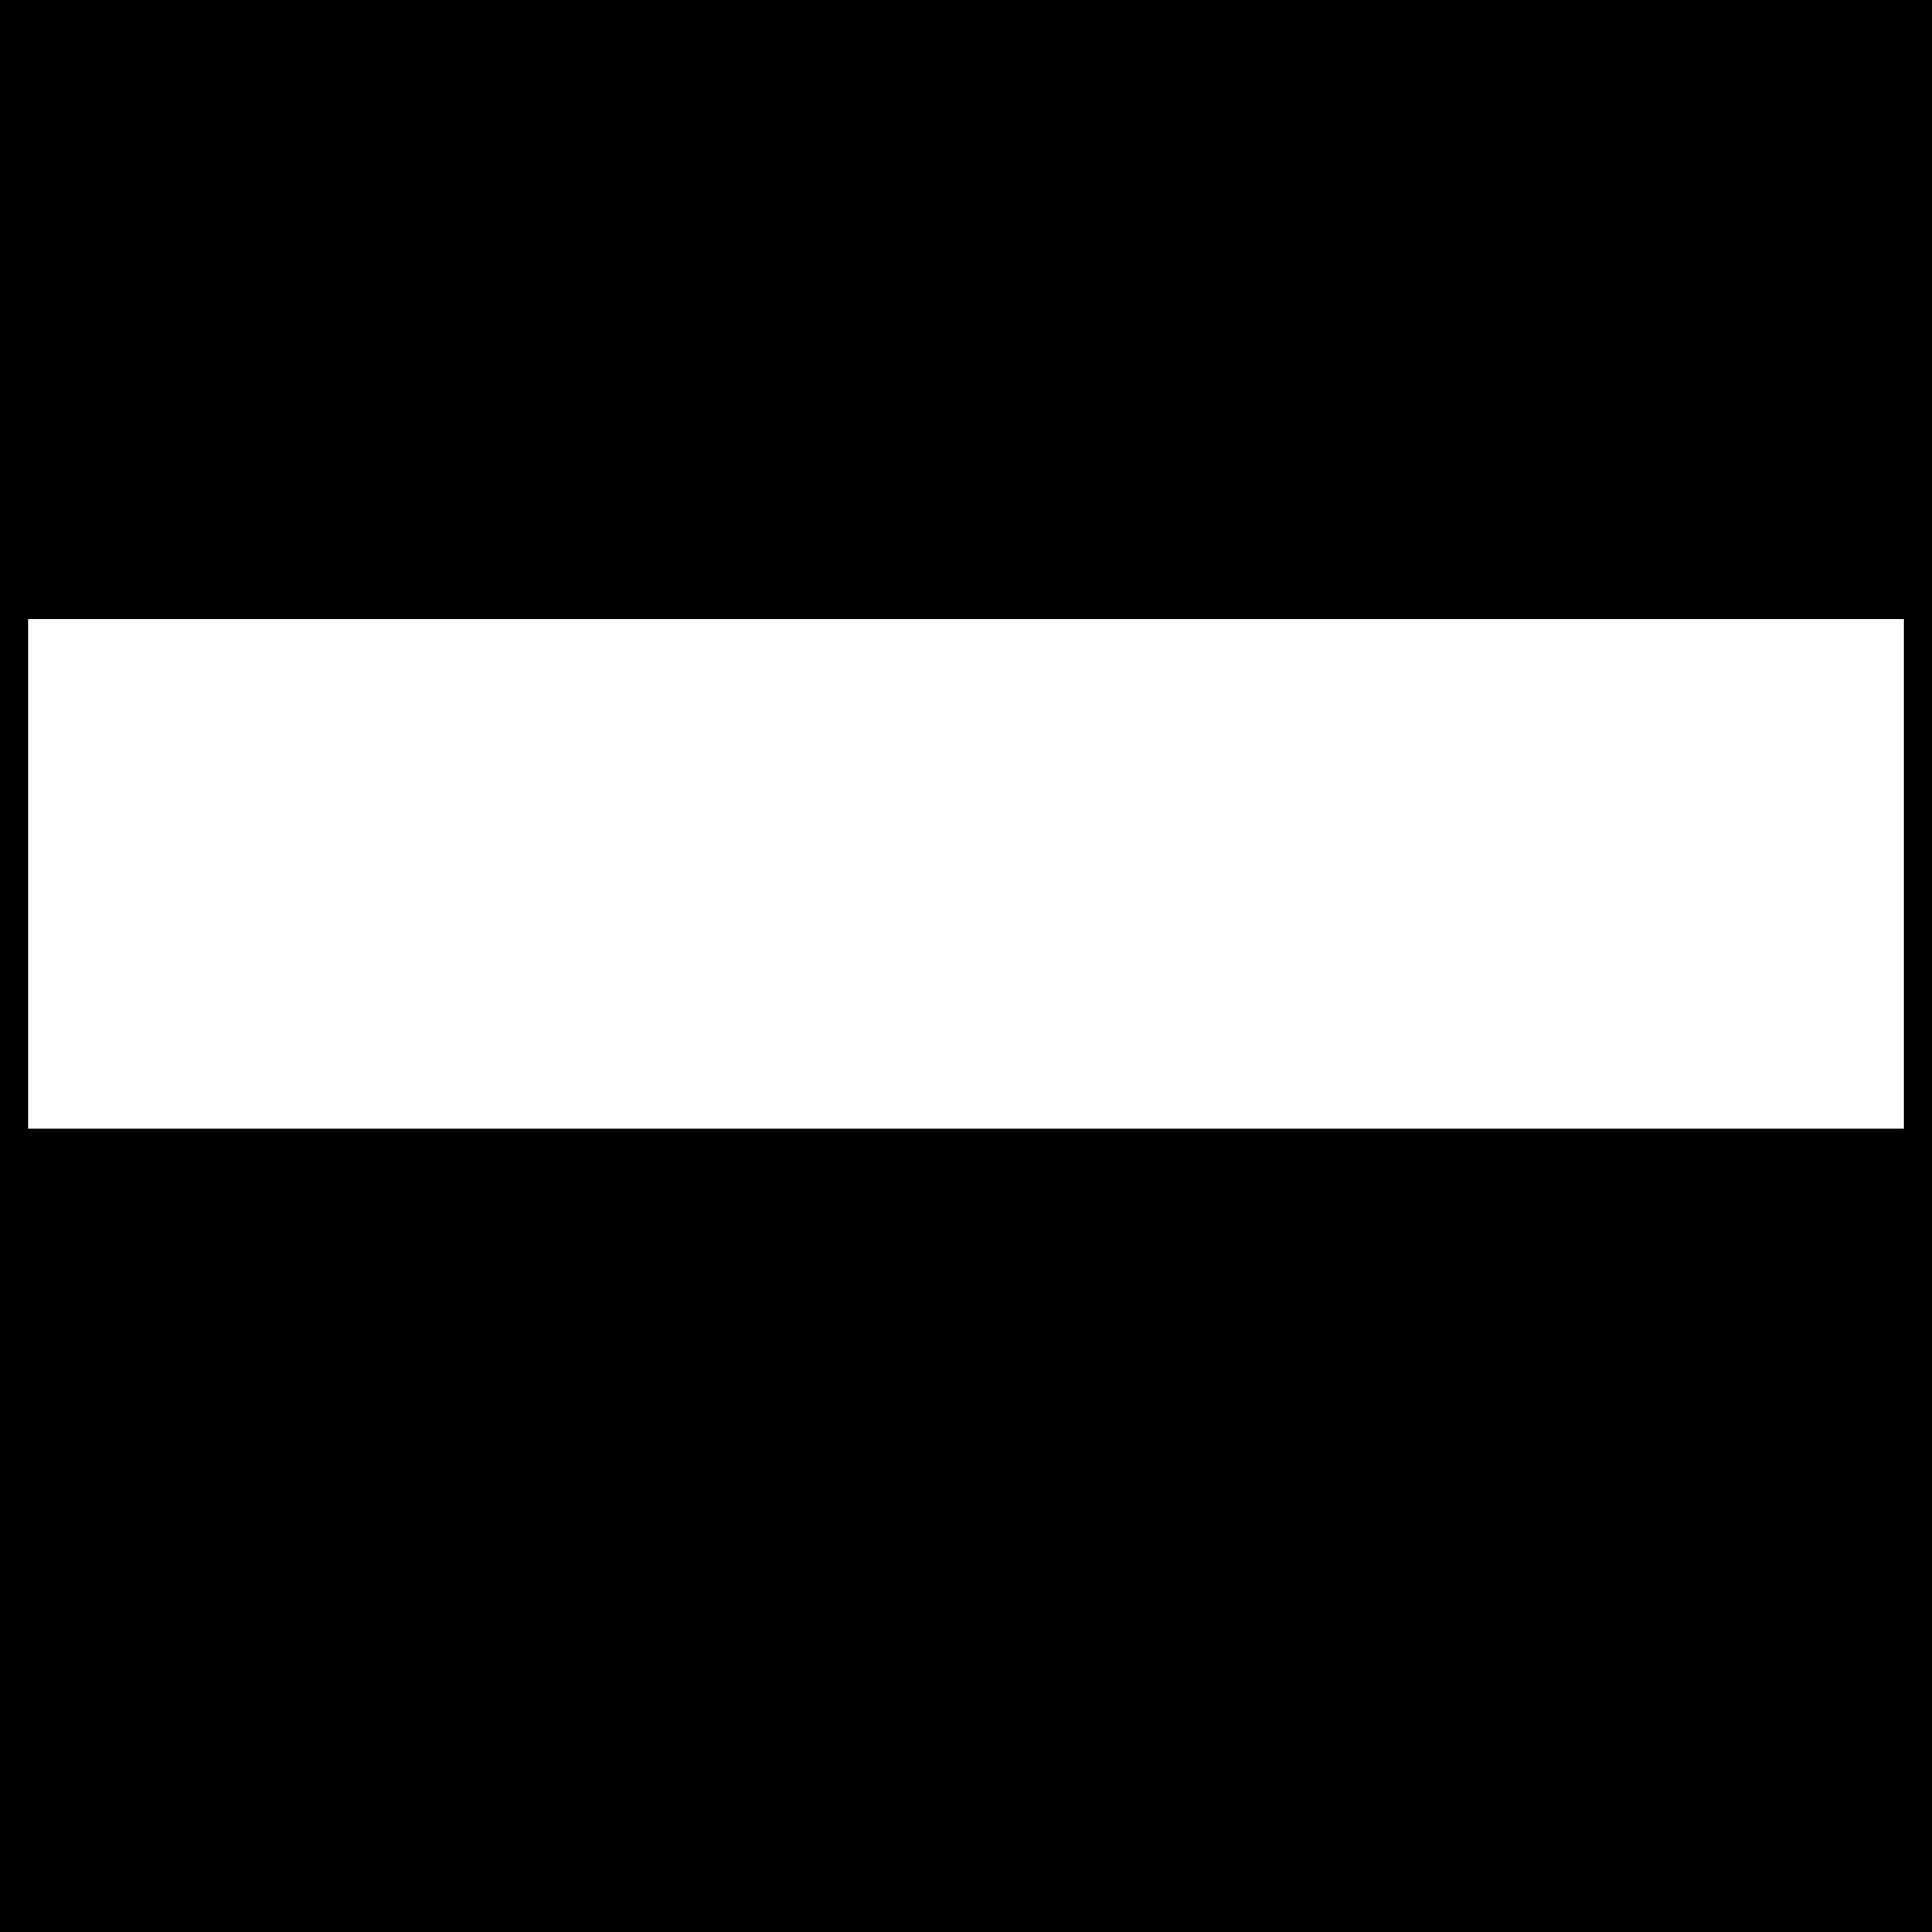 Quicken TurboTax Logo PNG Transparent & SVG Vector.